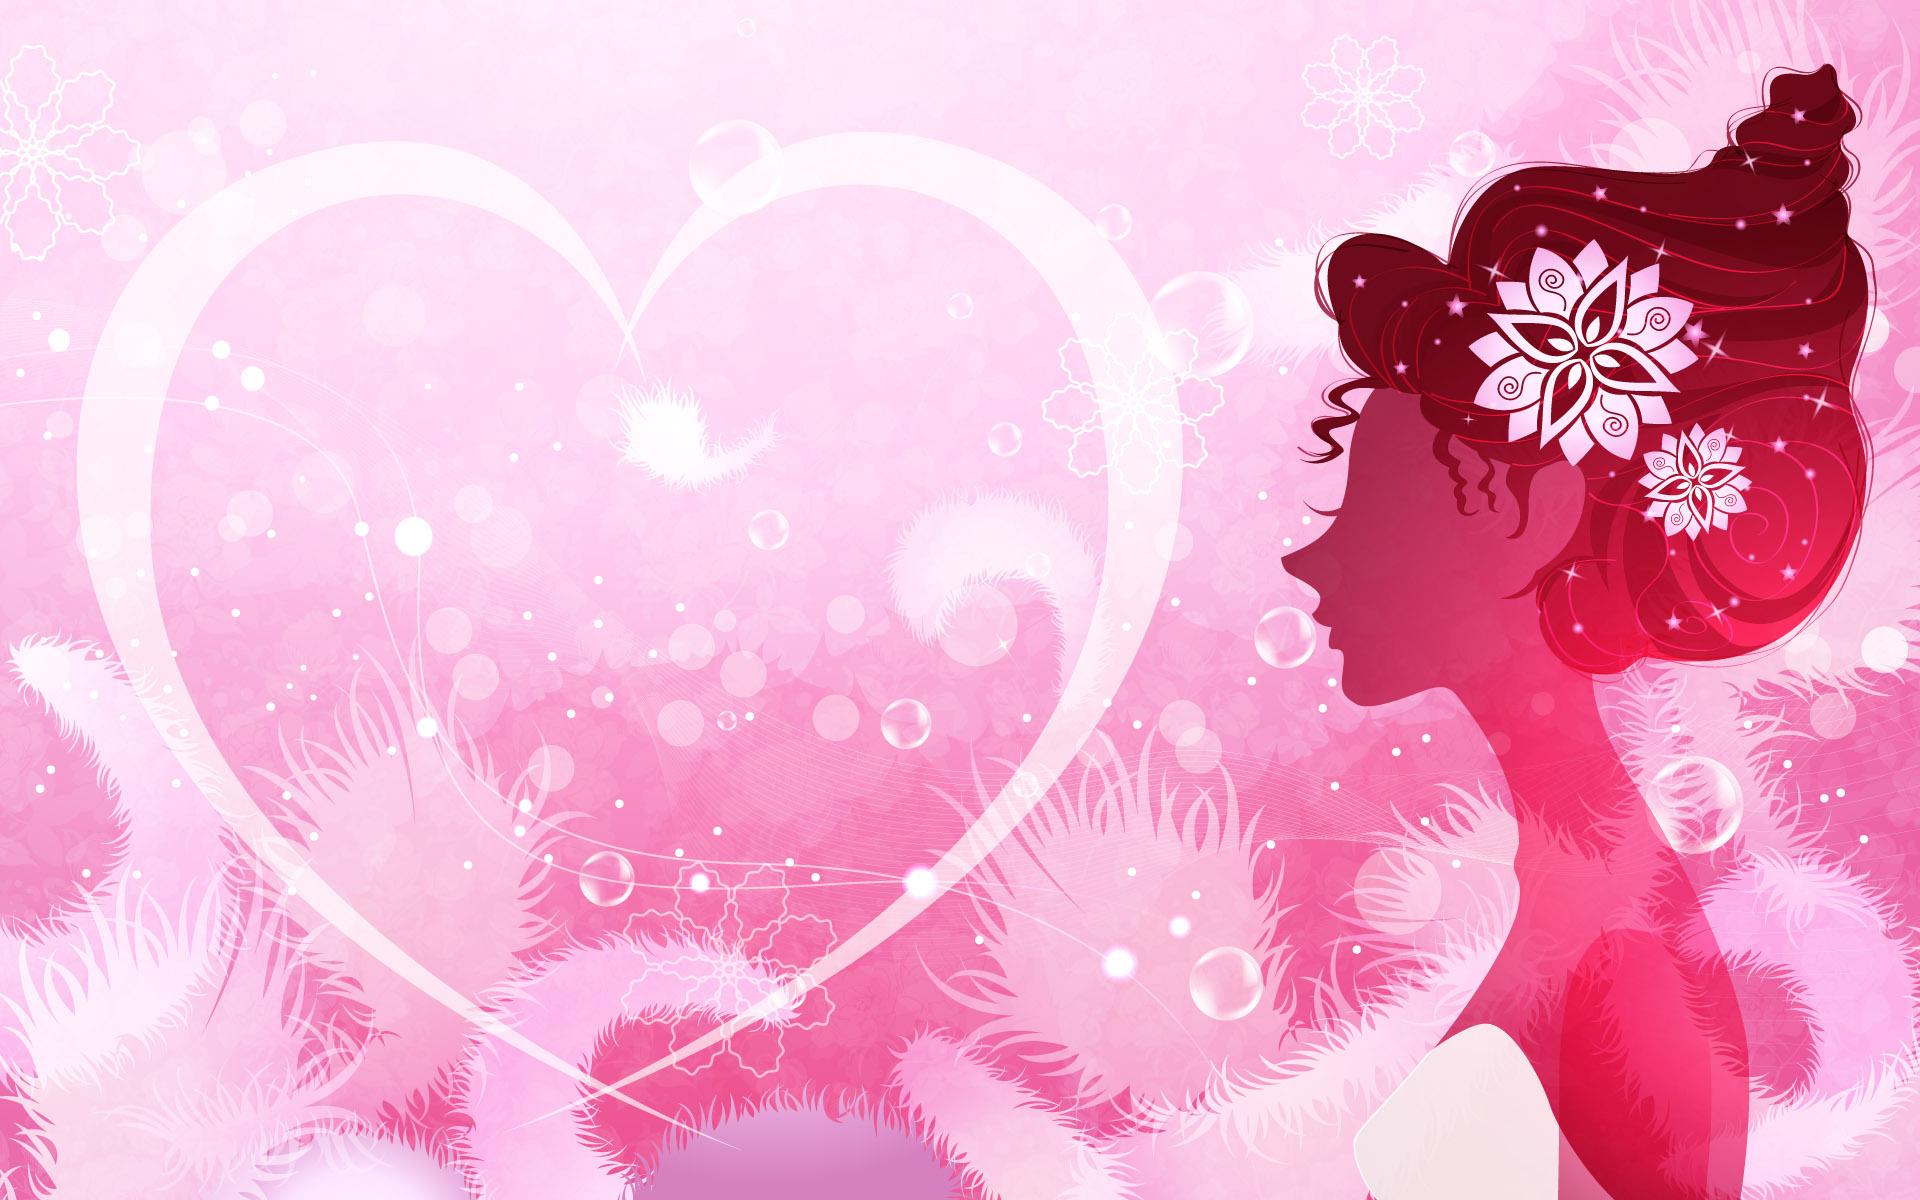 Cute Girly Backgrounds Desktop Image 1920x1200